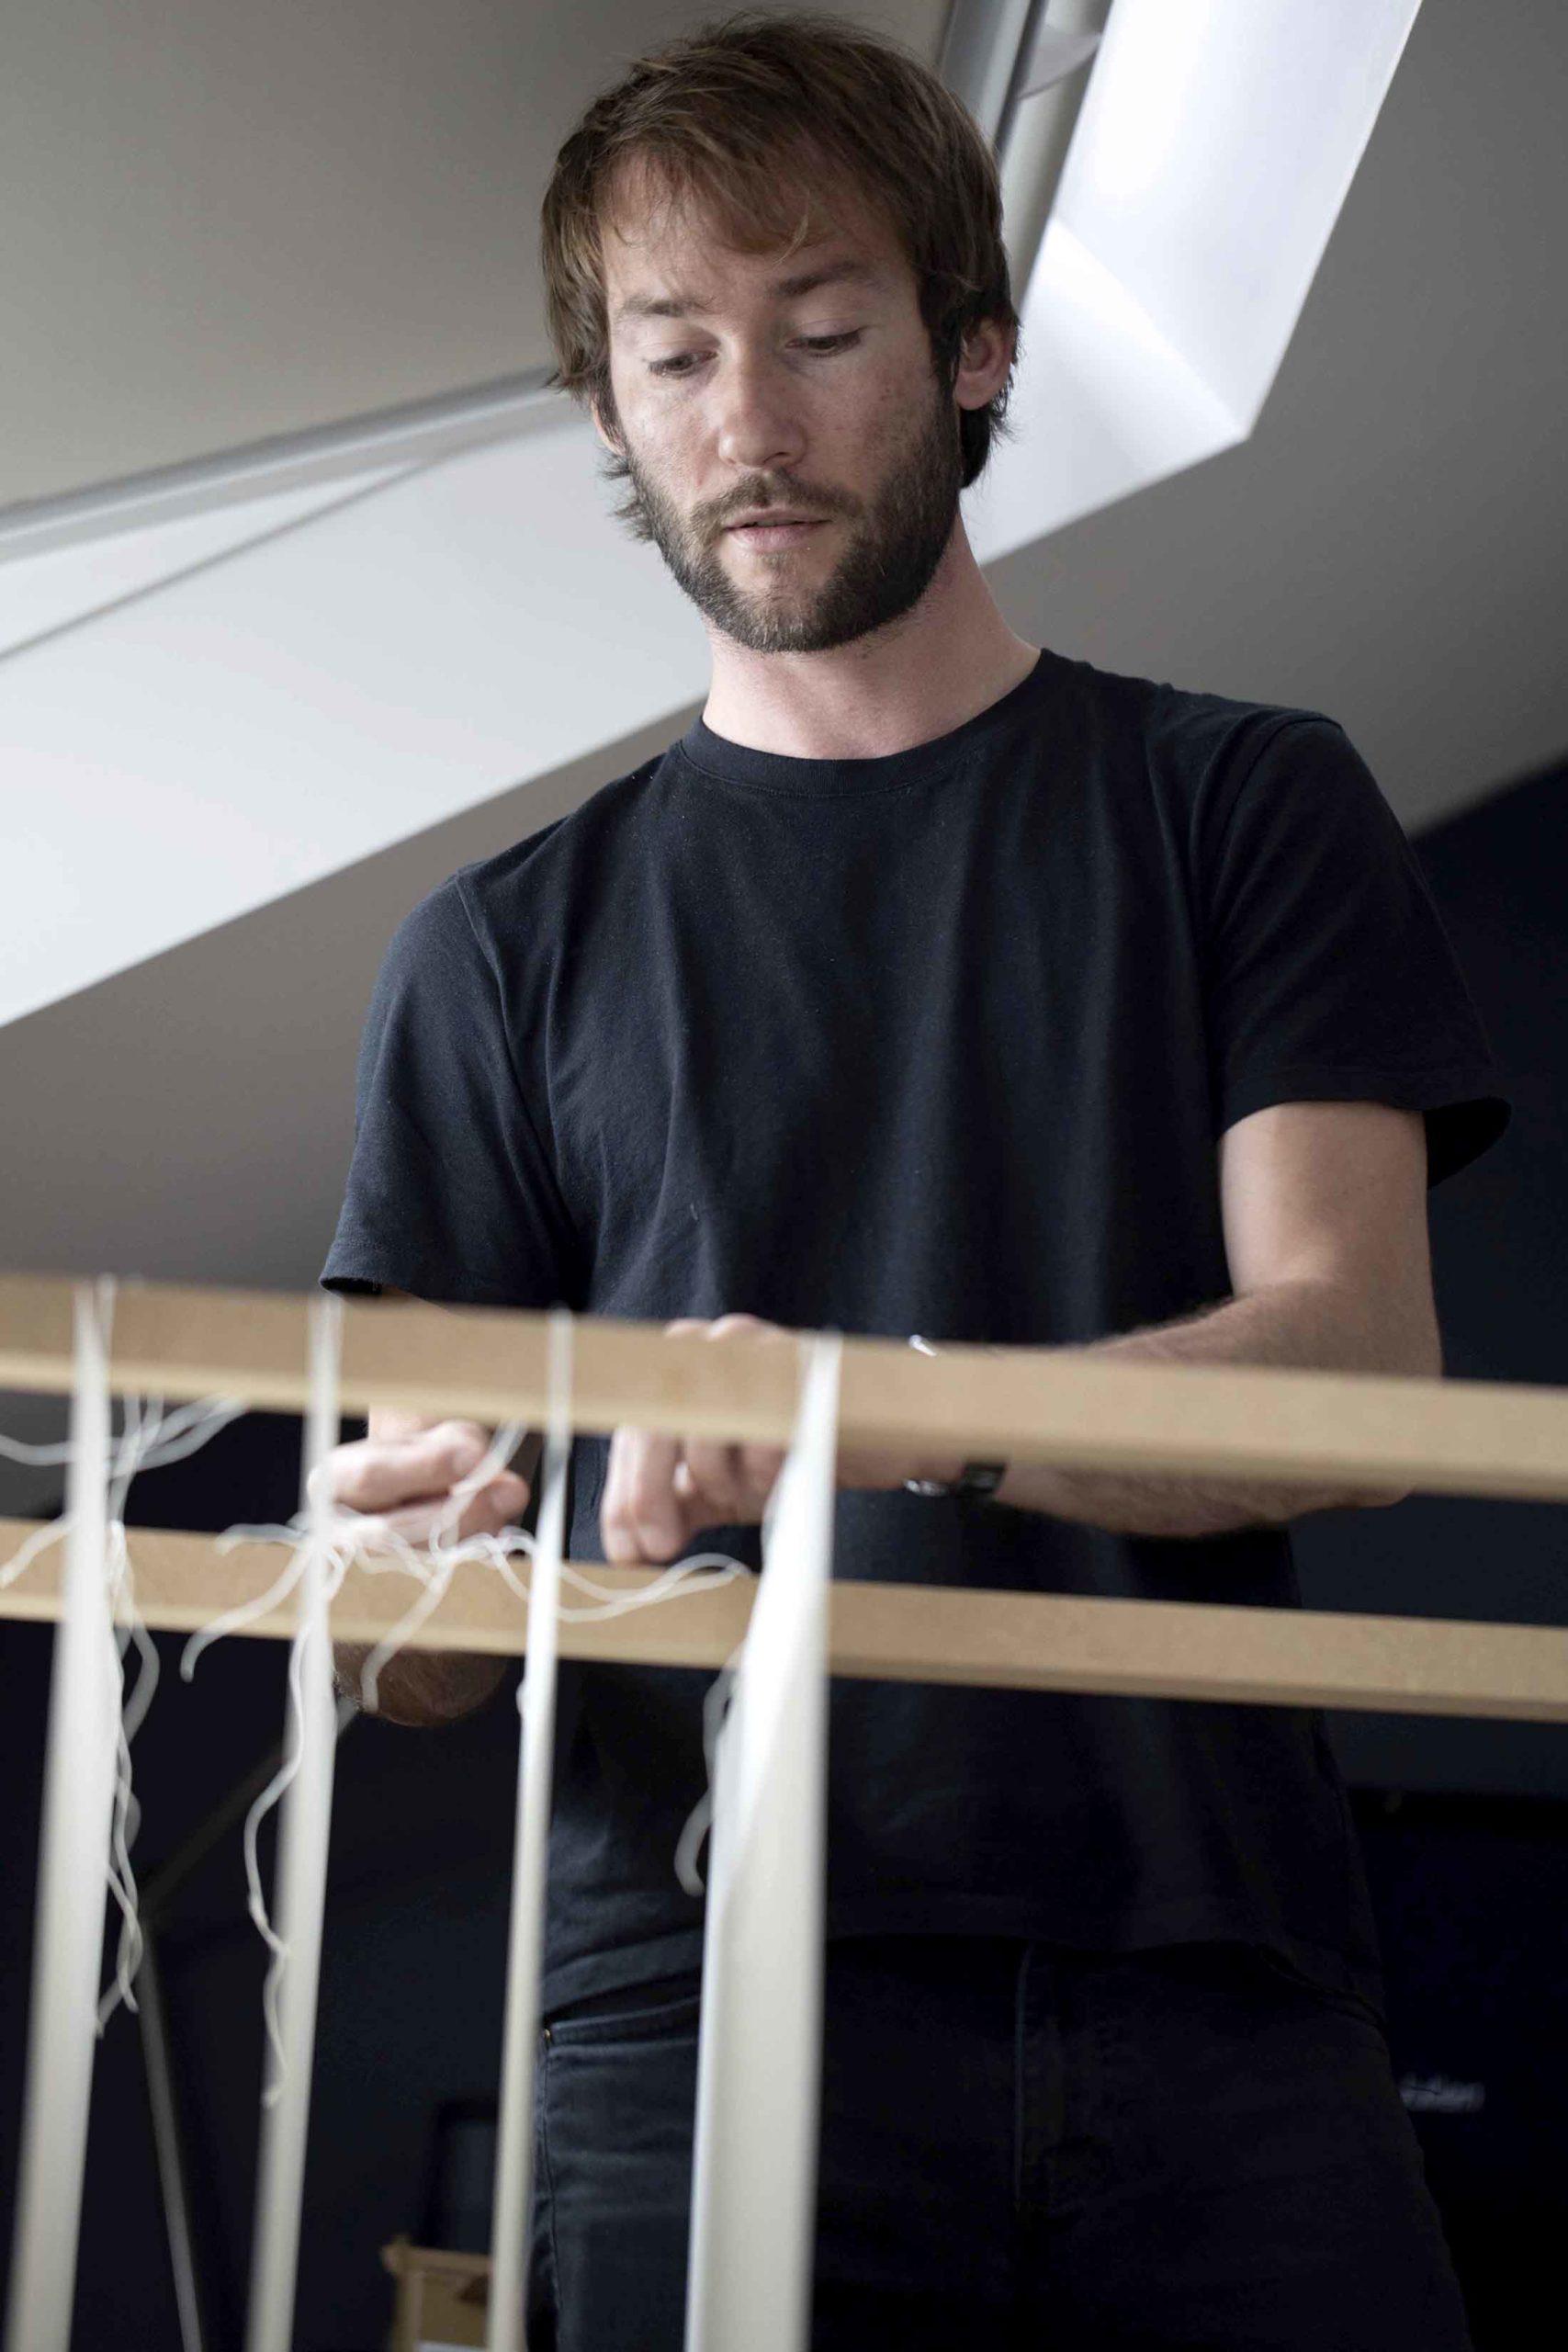 Geoffrey Chateau installation packshots photo lifestyle - Champagne Lafalise Froissart - Agence Discovery